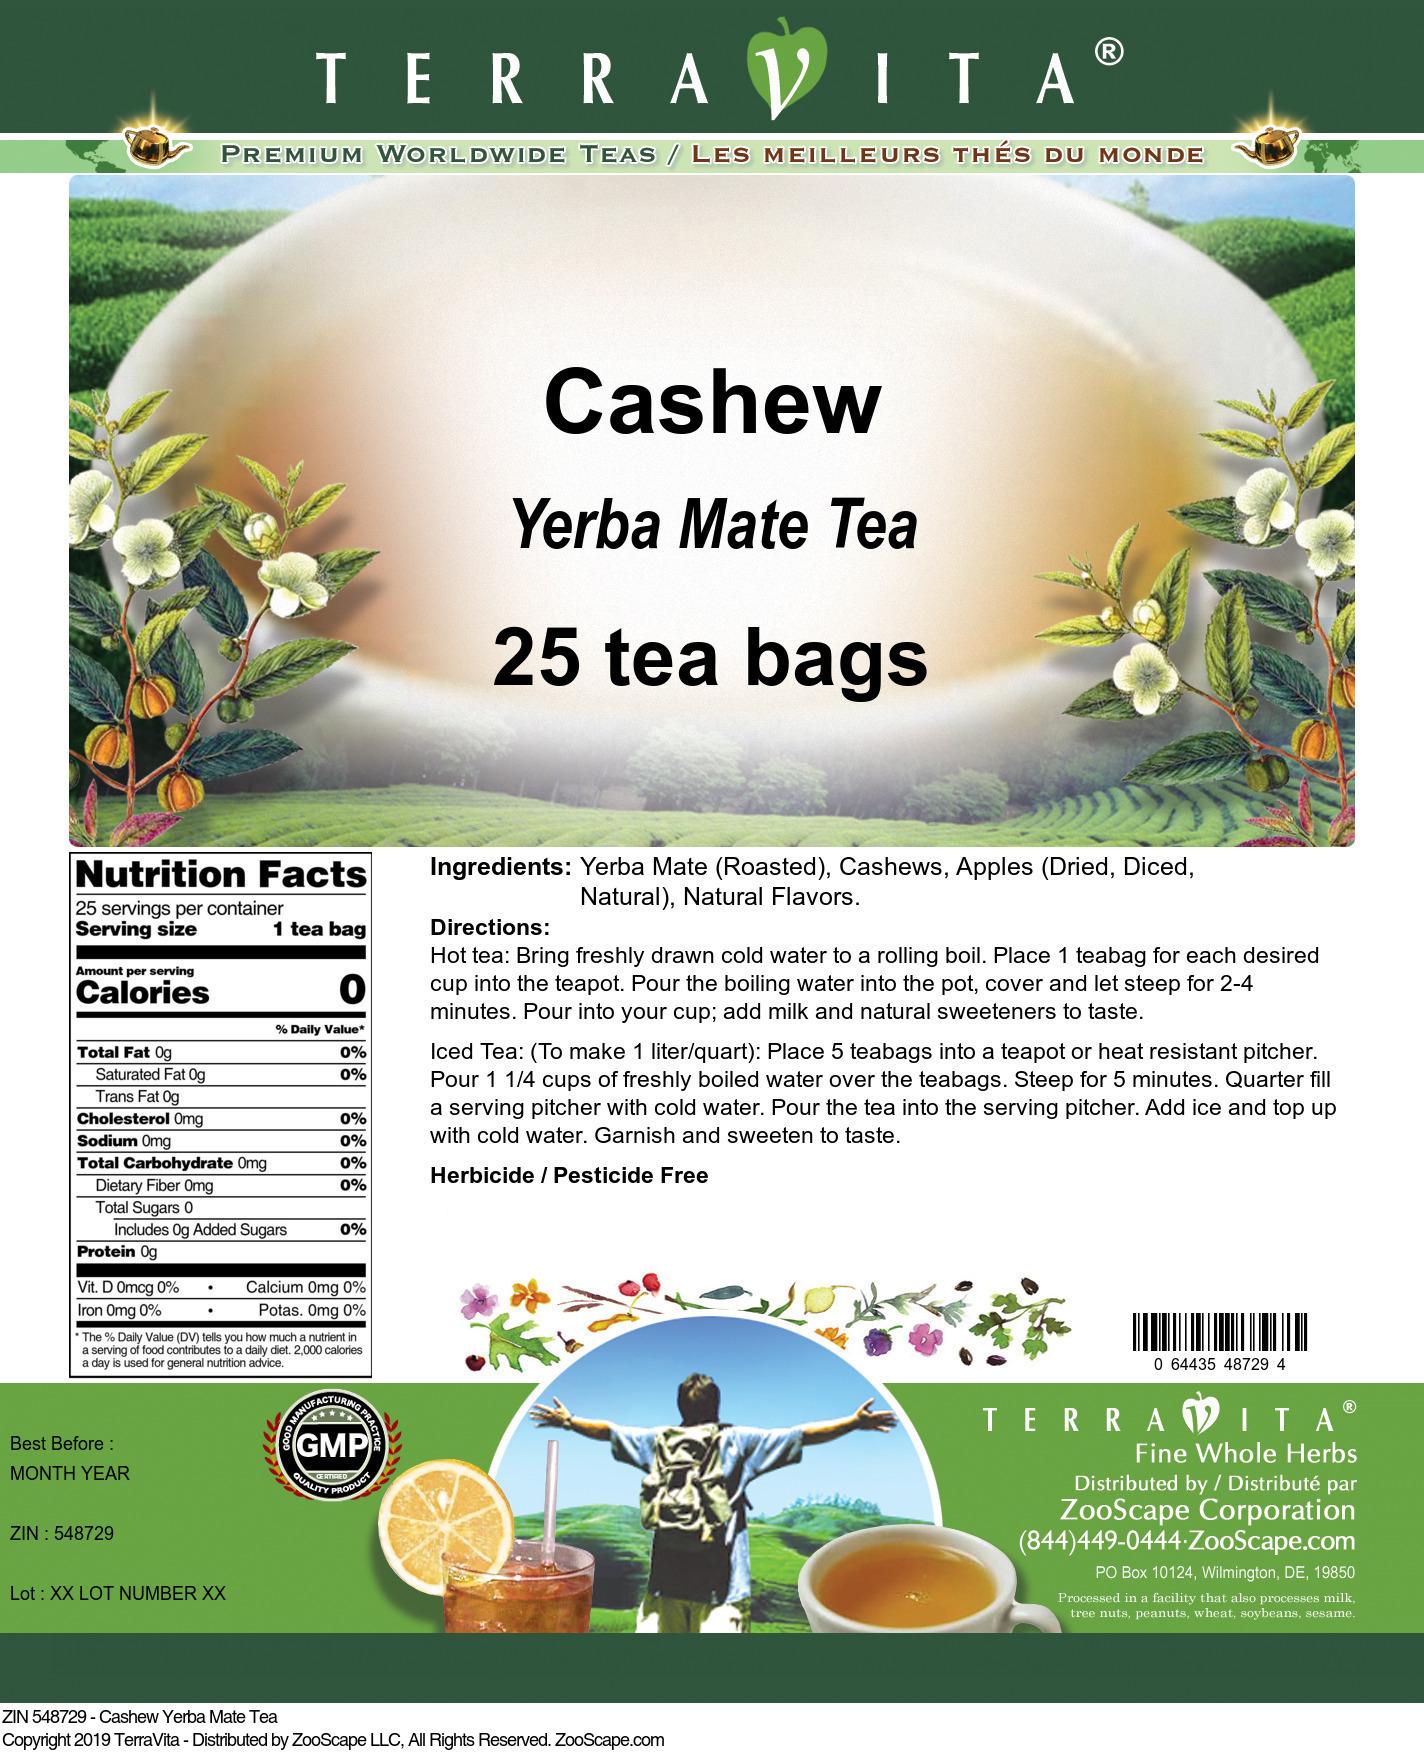 Cashew Yerba Mate Tea